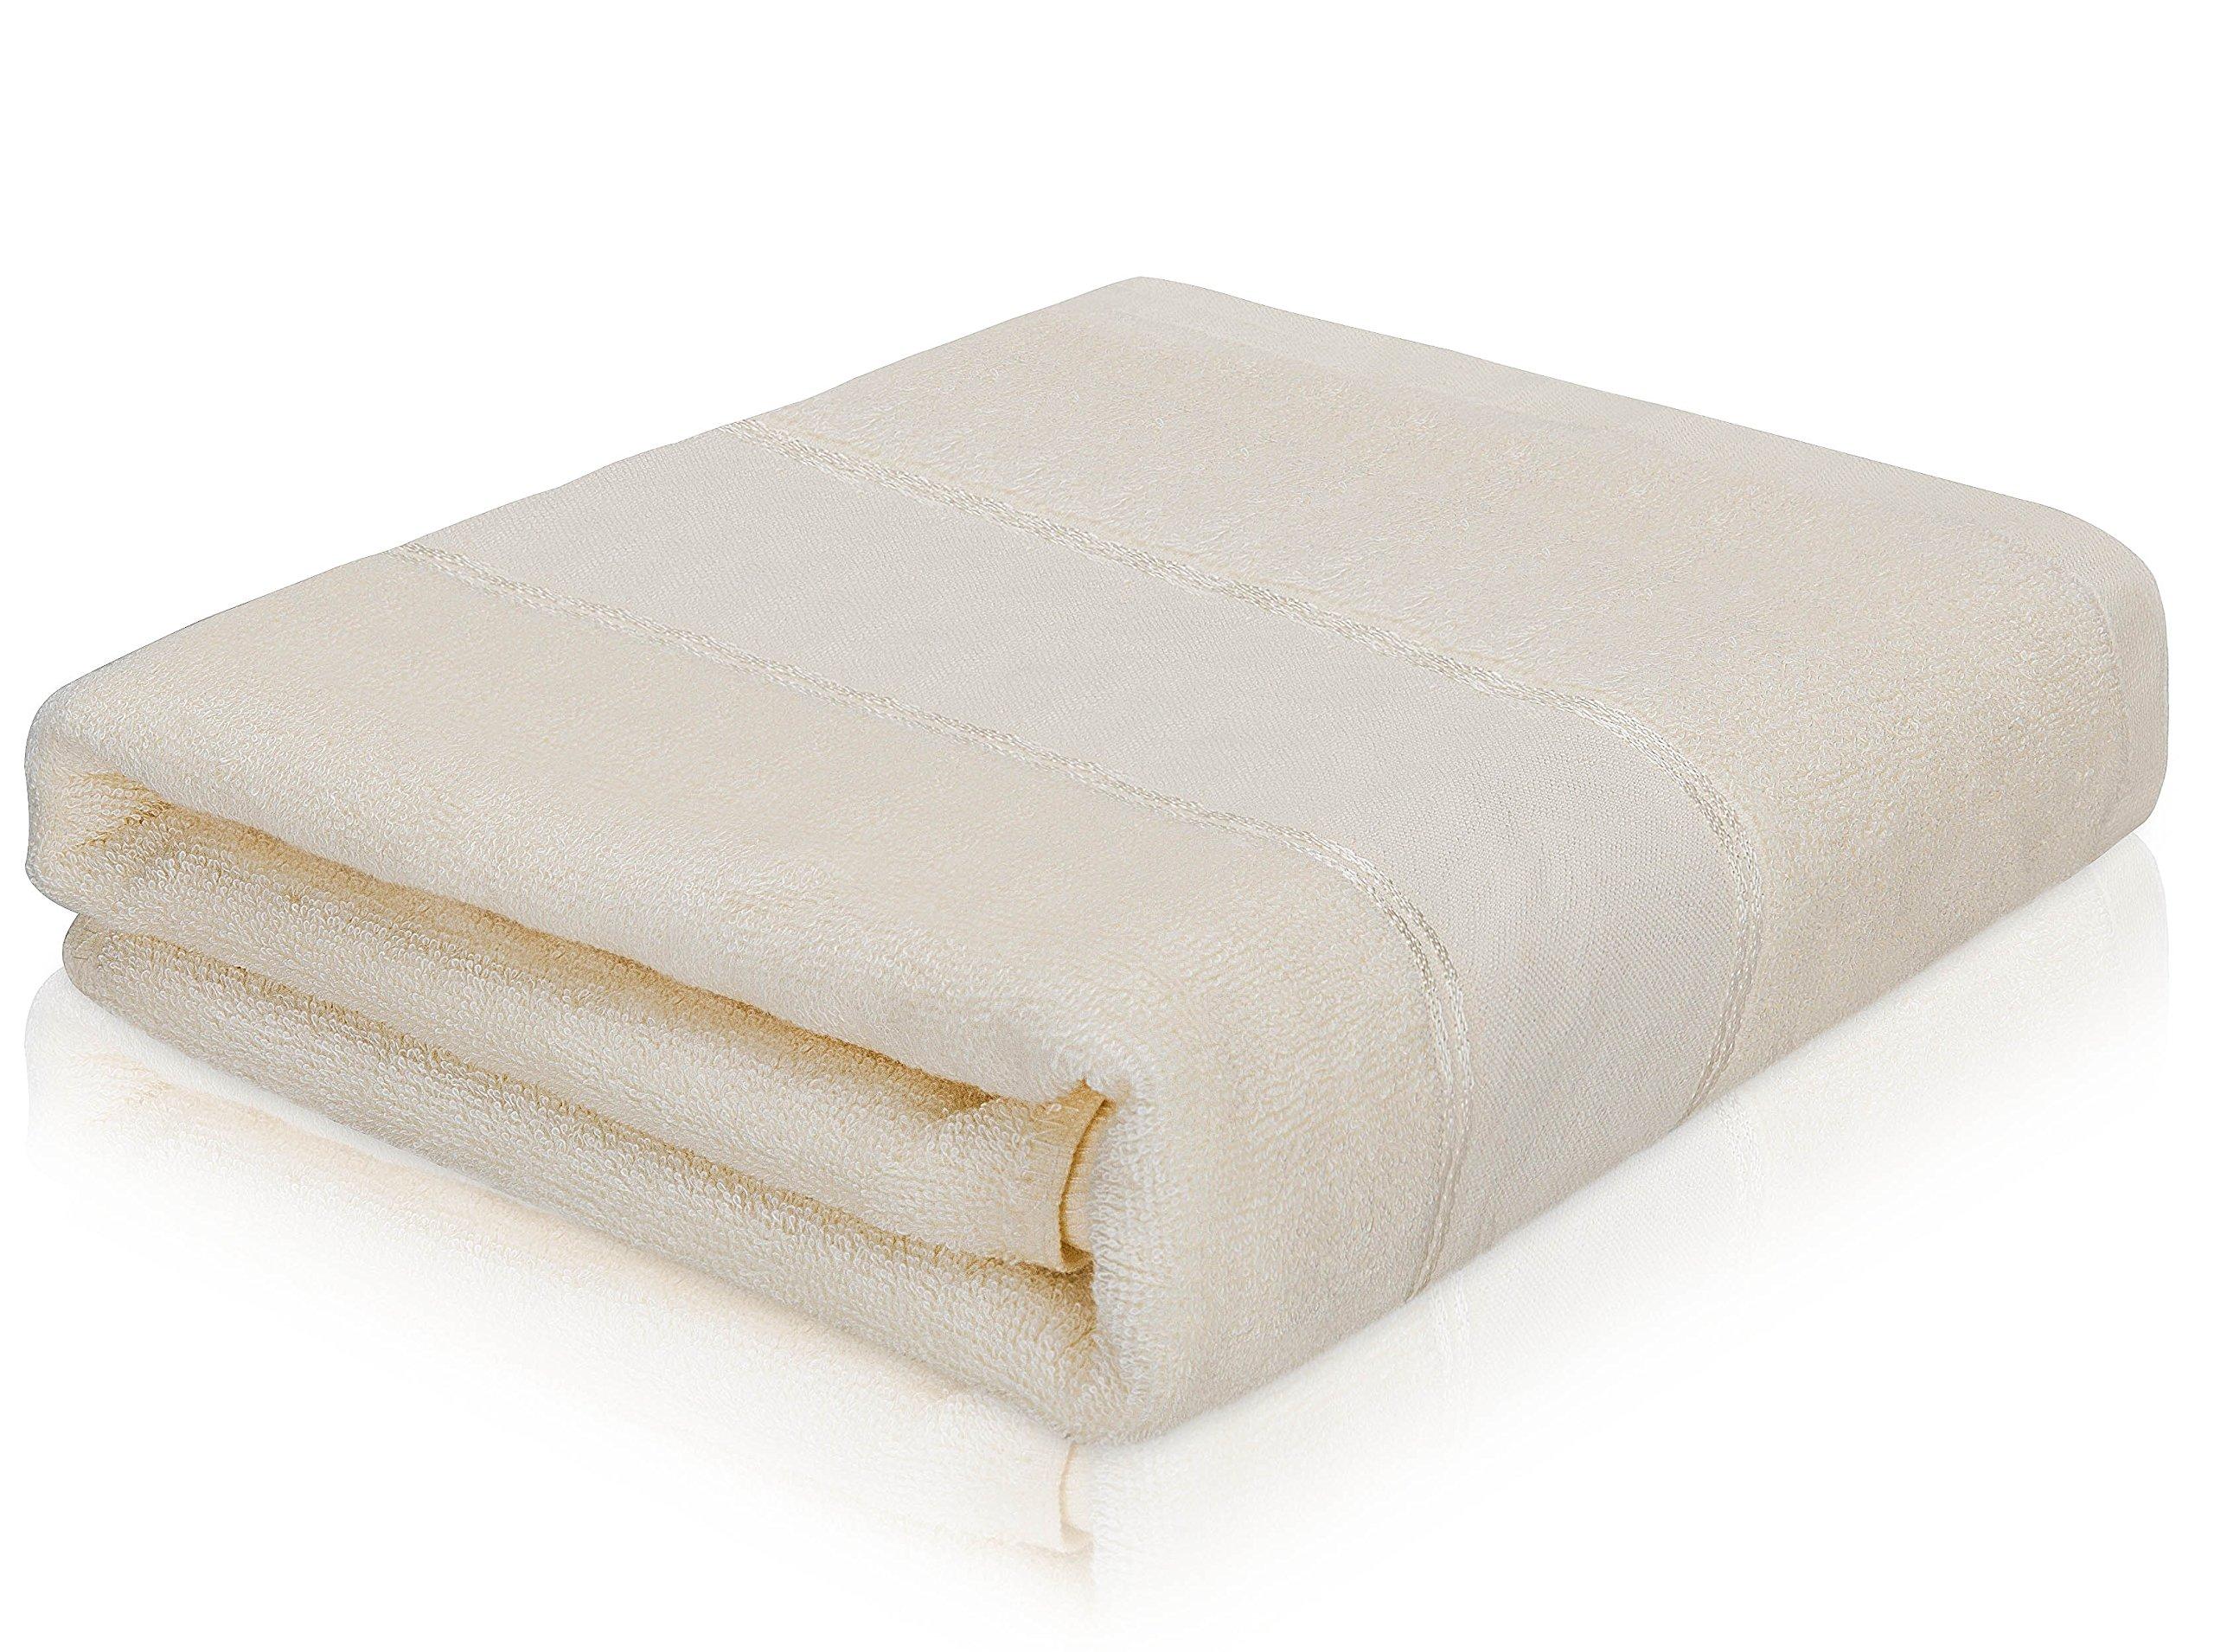 MOBUKIA Bath Towel Large Towel(28x55inch) Bamboo Microfiber Fast Drying Swimming Bathroom Towels (White)